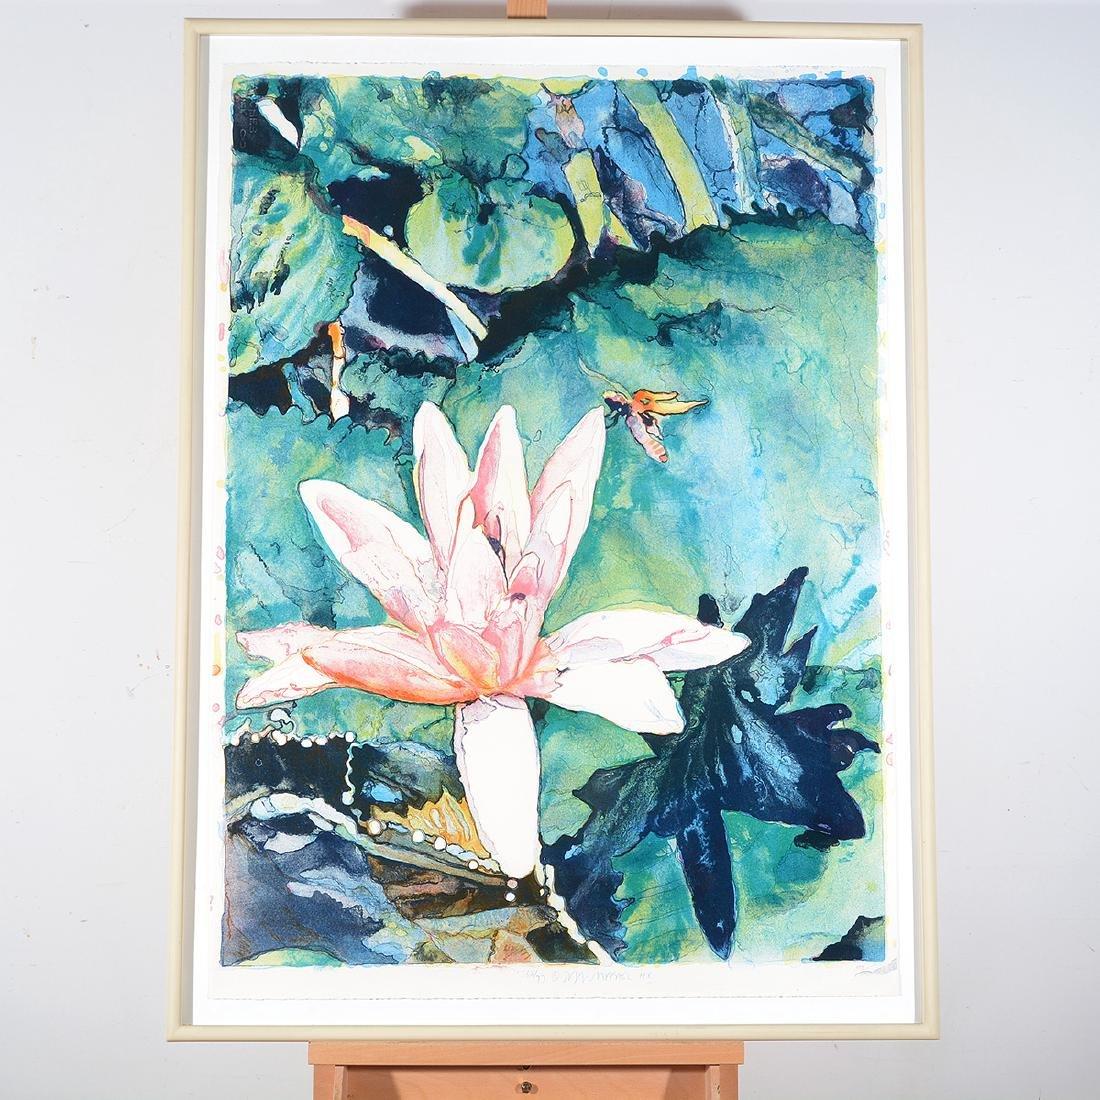 Joseph Raffael, Water lilies & Haiku Fish III lithos - 8